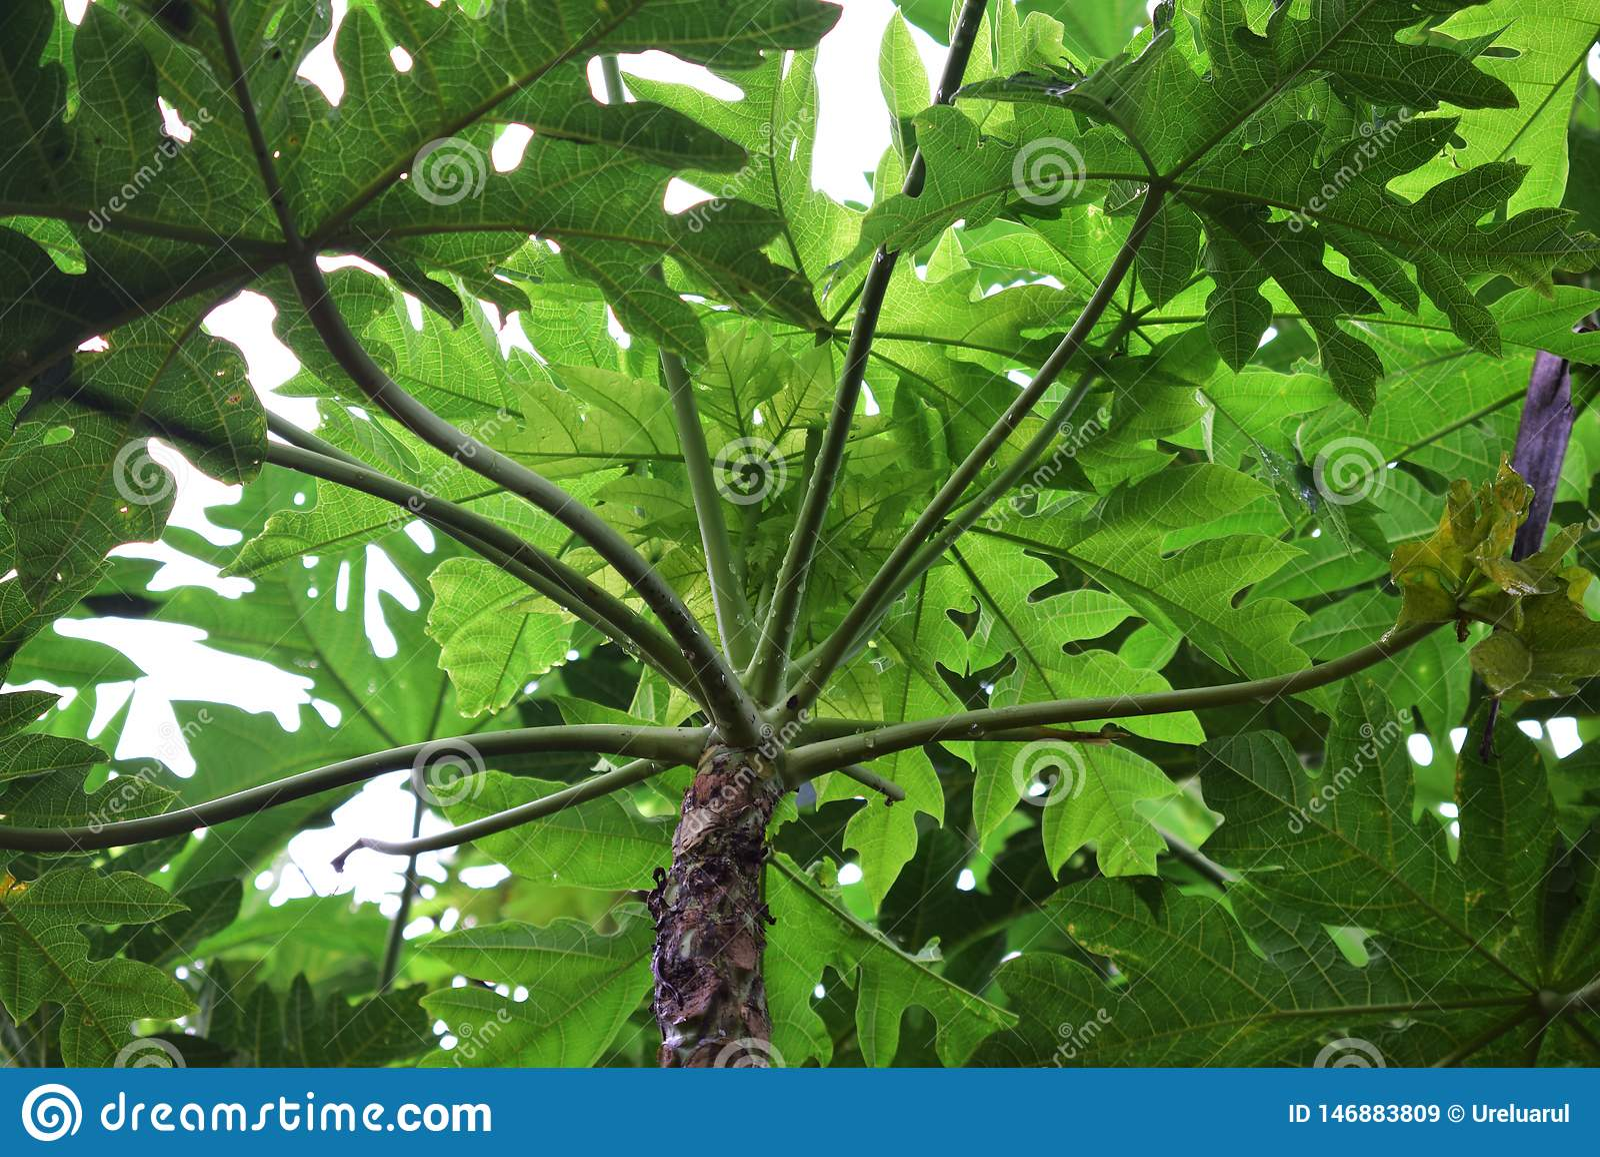 Papaya tree tip. Greeny. Top